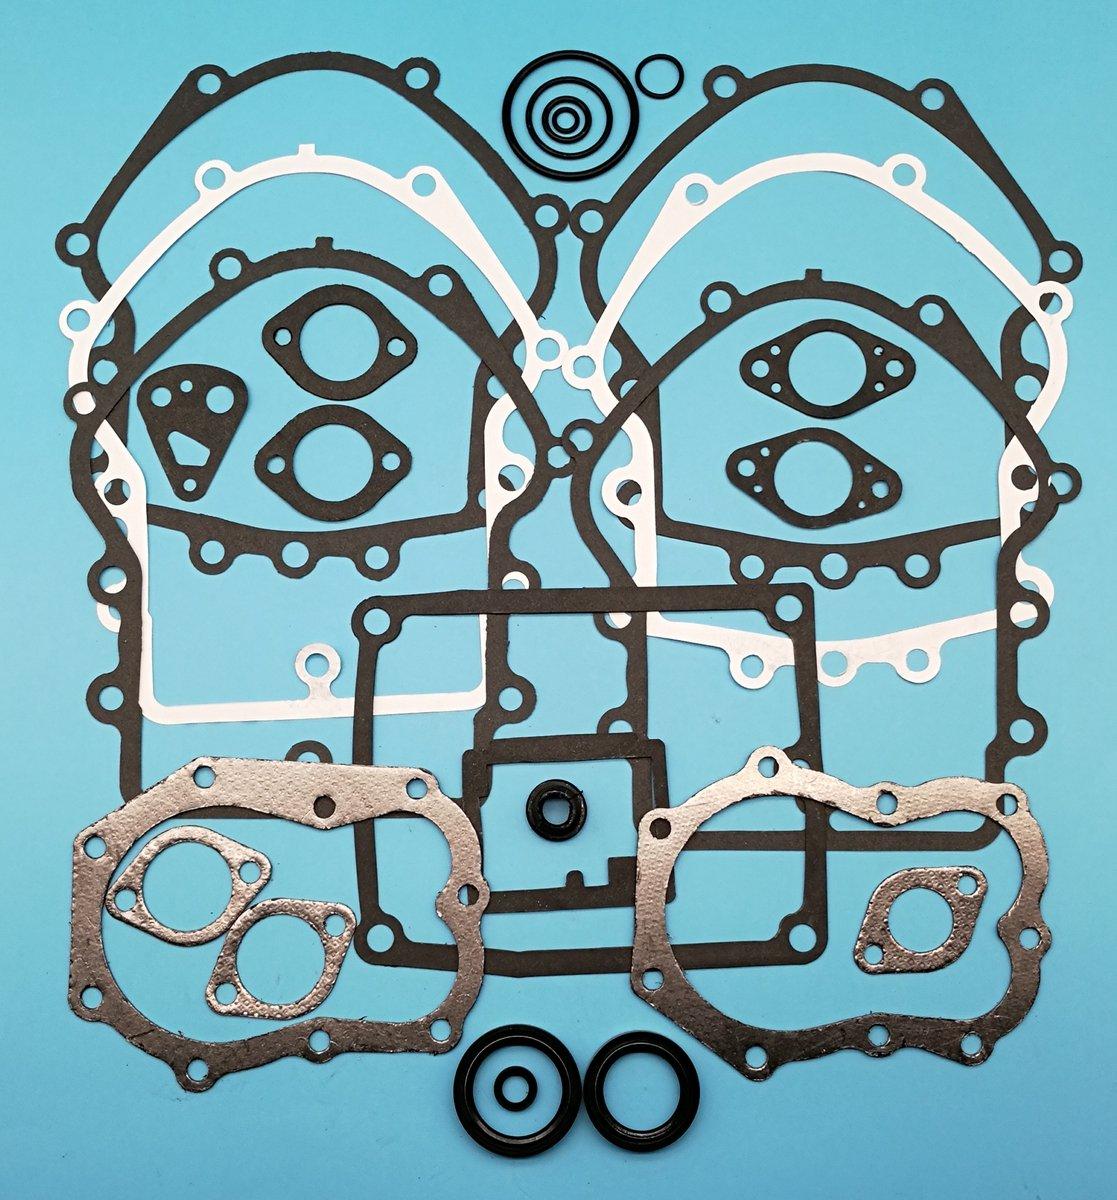 Tuzliufi Replace Top End Engine Gasket Kit Kawasaki KAF620 KAF 620 Mule 2500 2510 3000 3010 3020 4000 4010 1994-2003 2004 2005 2006 2007 2008 2009 2010 2011 2012 2013 2014 2015 2016 2017 2018 Z278